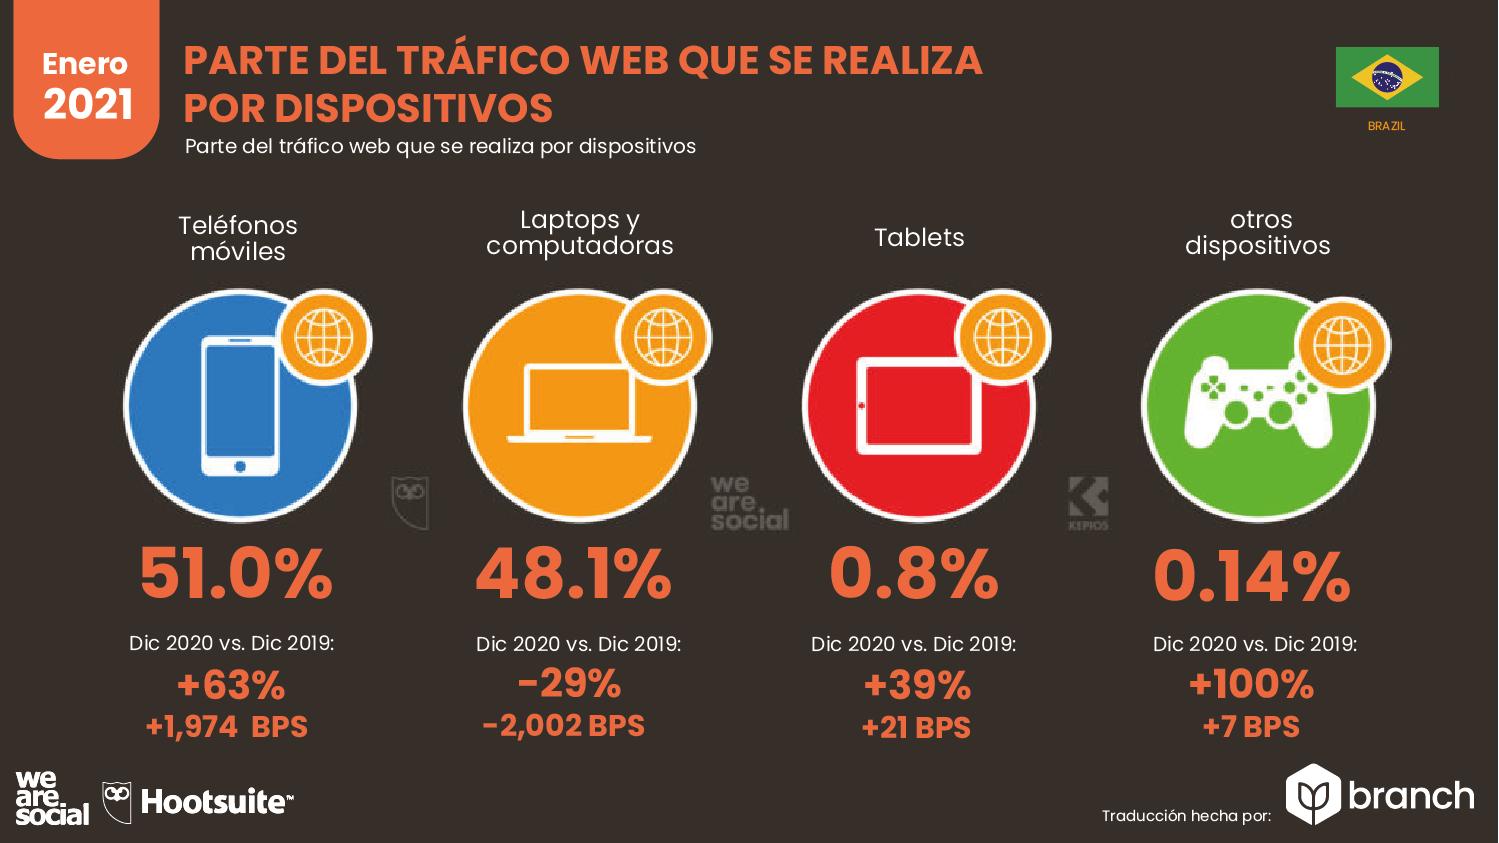 trafico-web-por-dispositivos-brasil-2020-2021